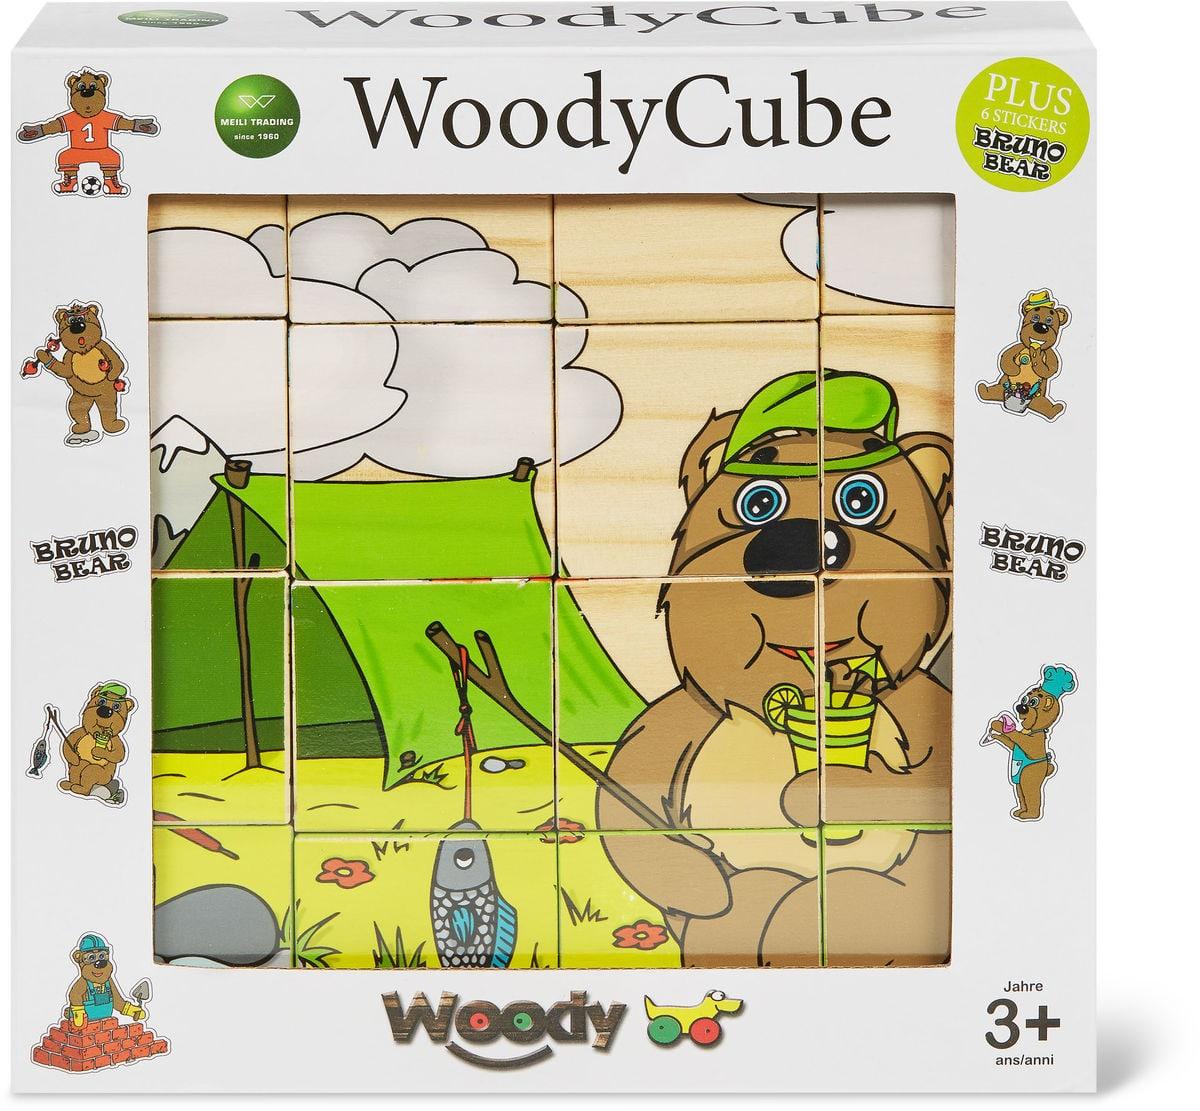 Woody Cube Puzzle Würfel Fsc Puzzle